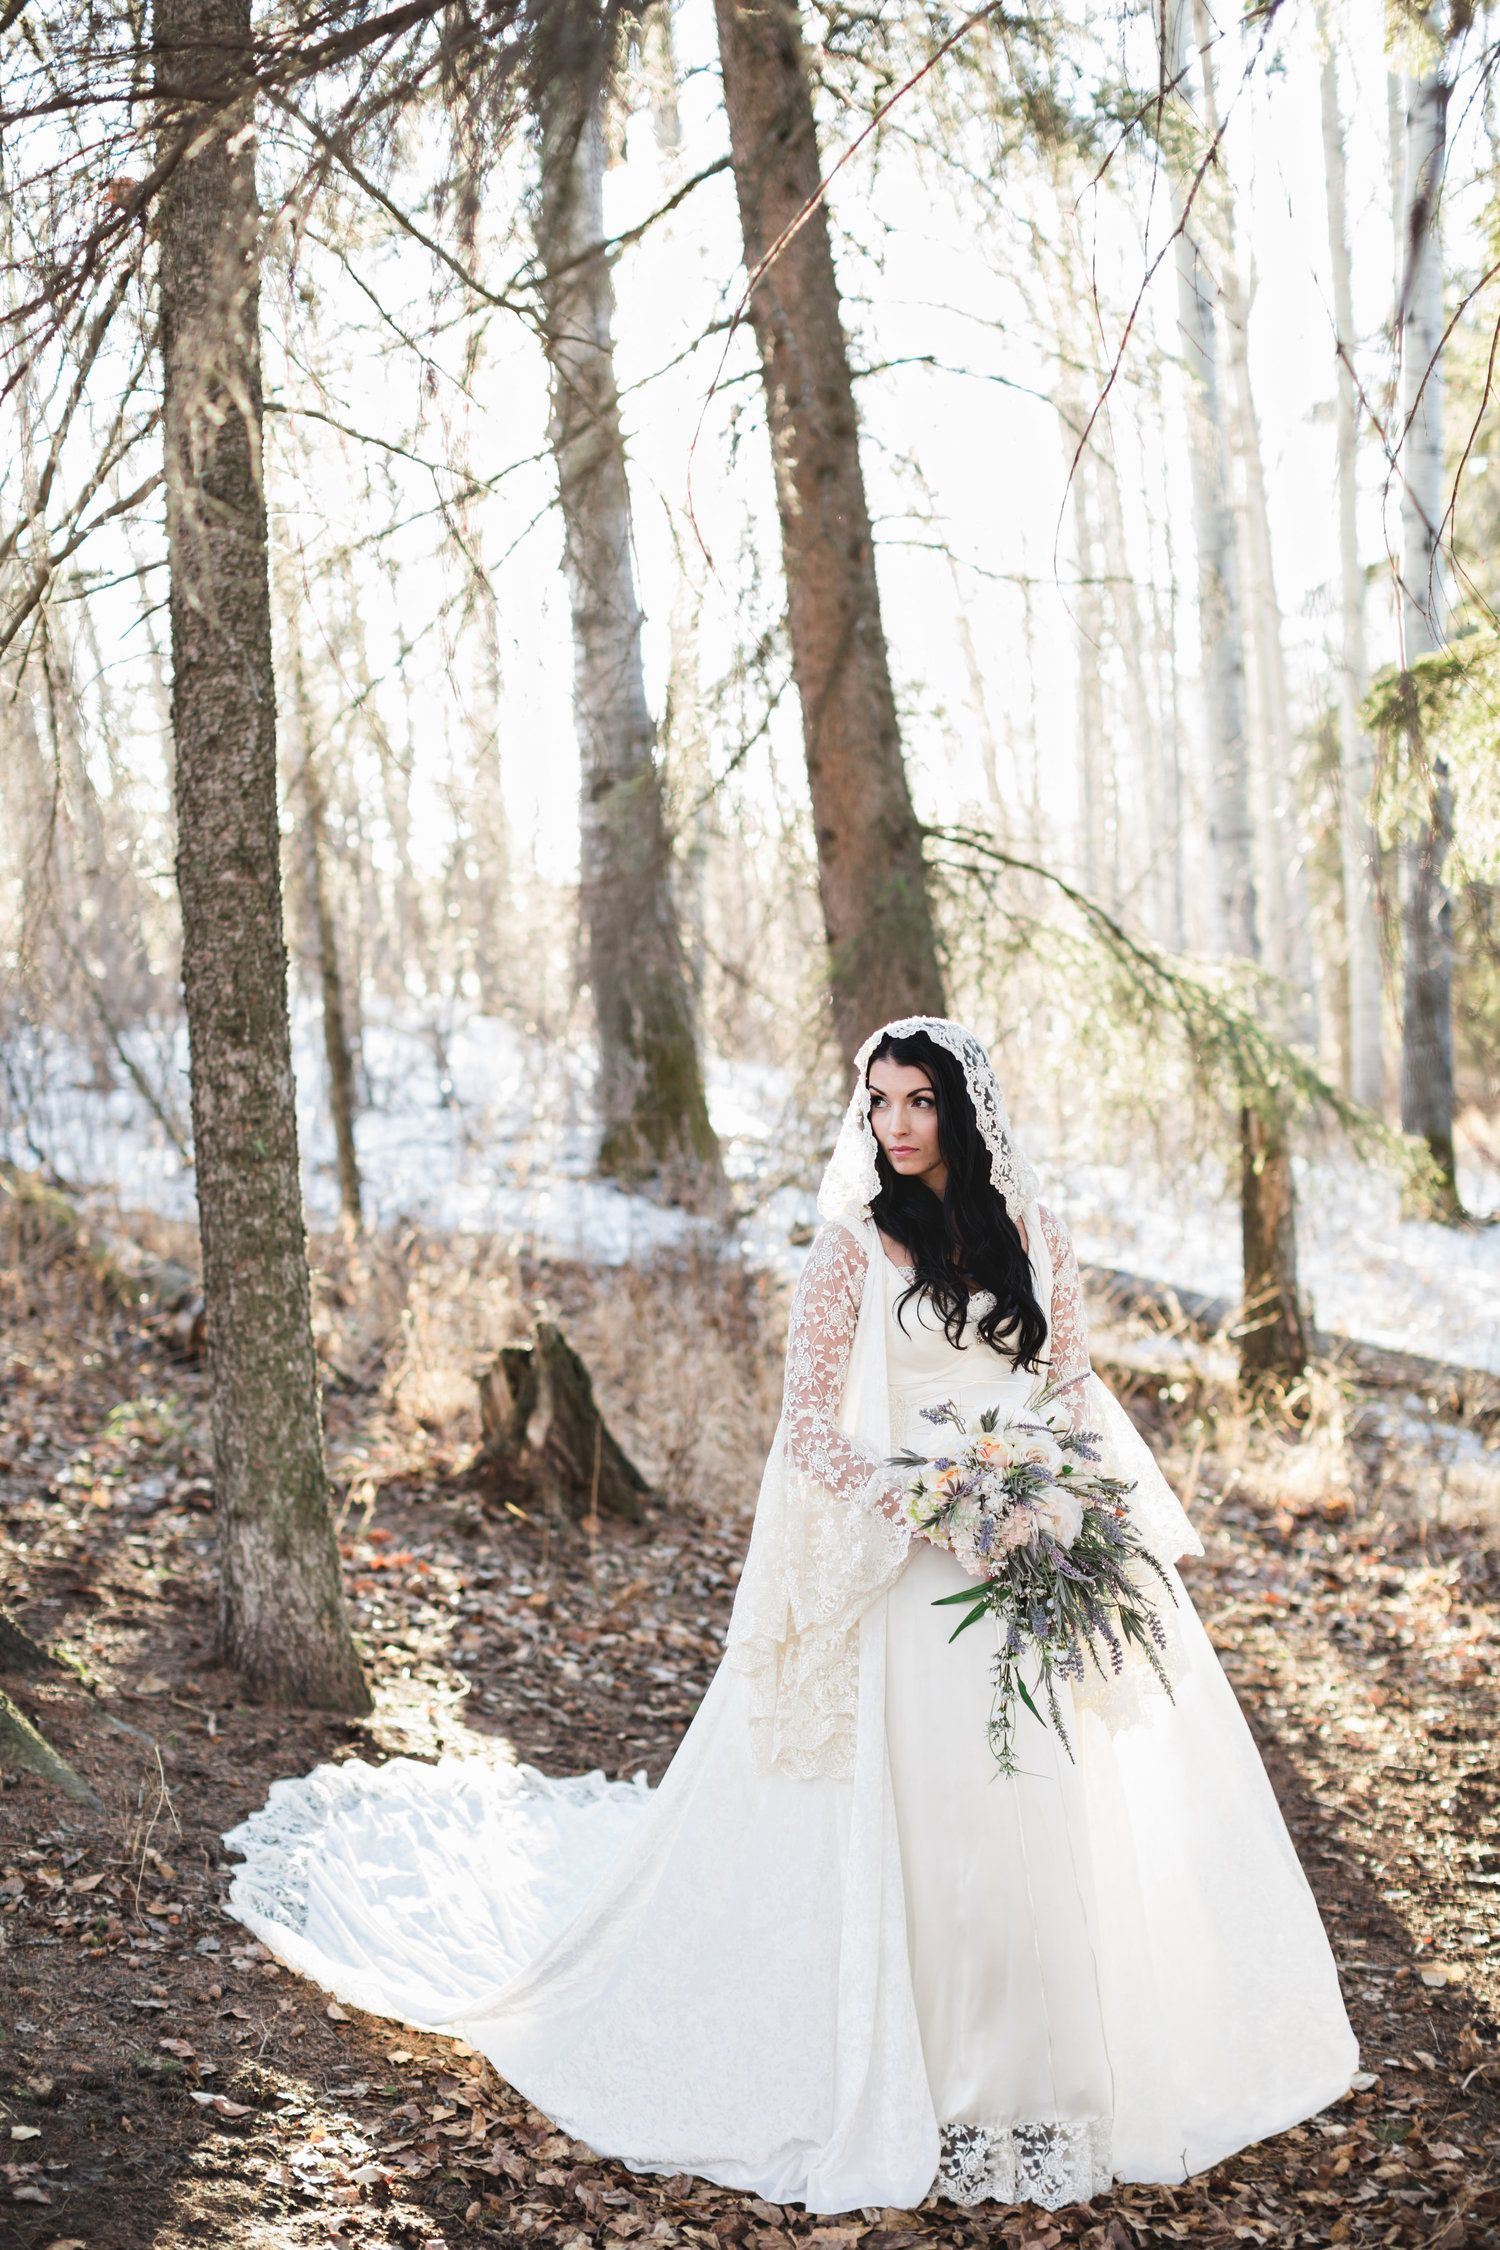 Snowwhite   Weddings-Fairytale-Vintage Romantic   Pinterest ...